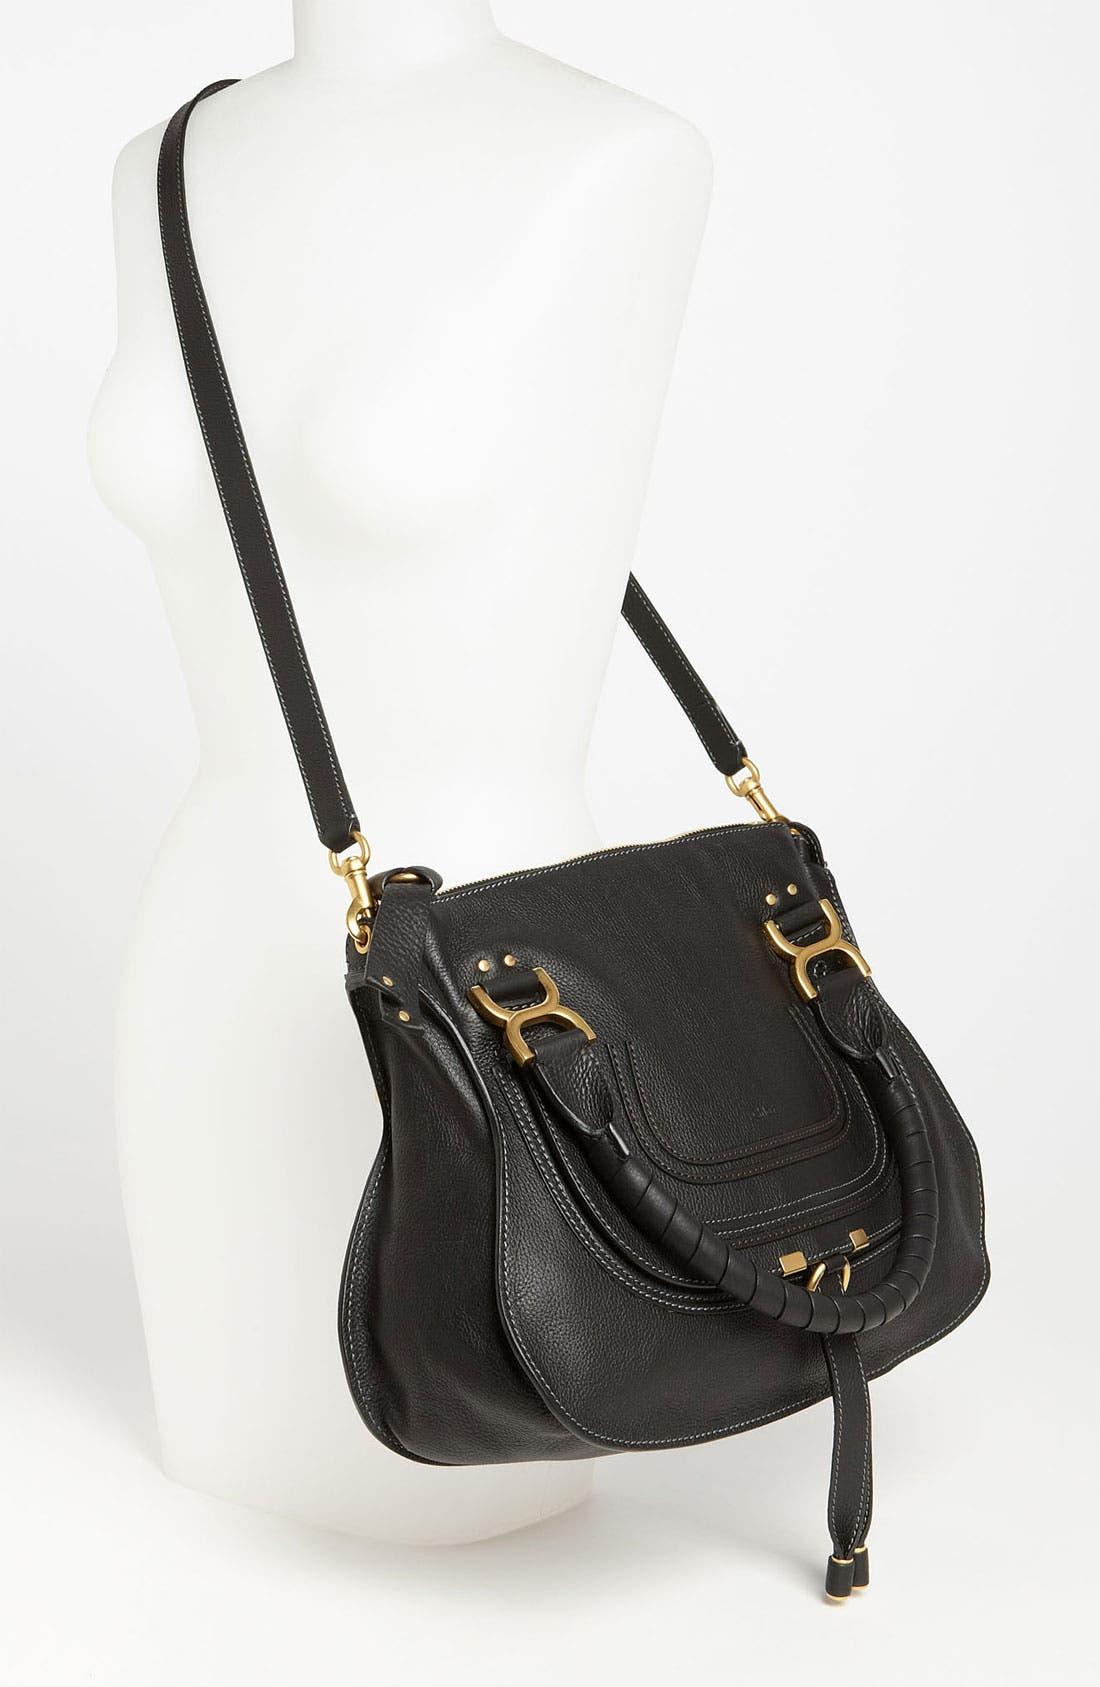 CHLOÉ, 'Medium Marcie' Leather Satchel, Alternate thumbnail 8, color, BLACK GOLD HRDWRE